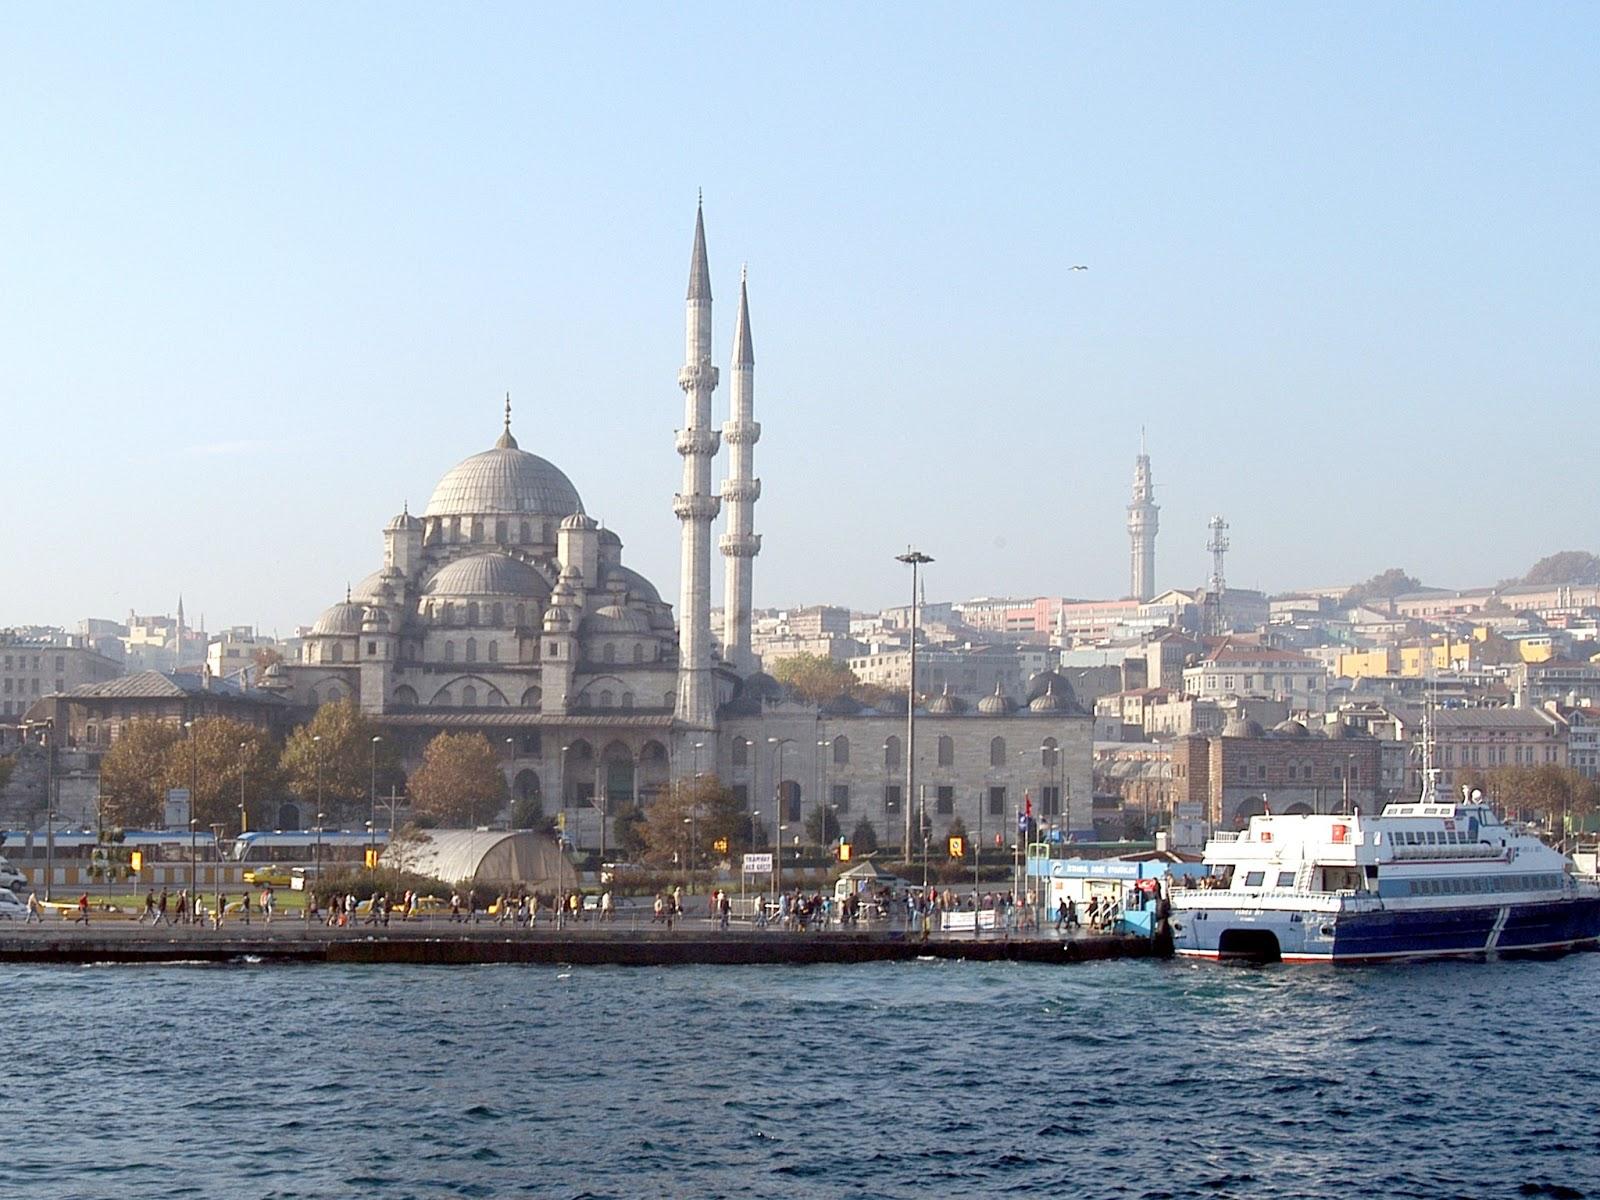 http://1.bp.blogspot.com/-owvdRQ13Tmo/UV6e1nPGQWI/AAAAAAAAClg/IOlkROXrfwk/s1600/New_Mosque_Istanbul.jpg